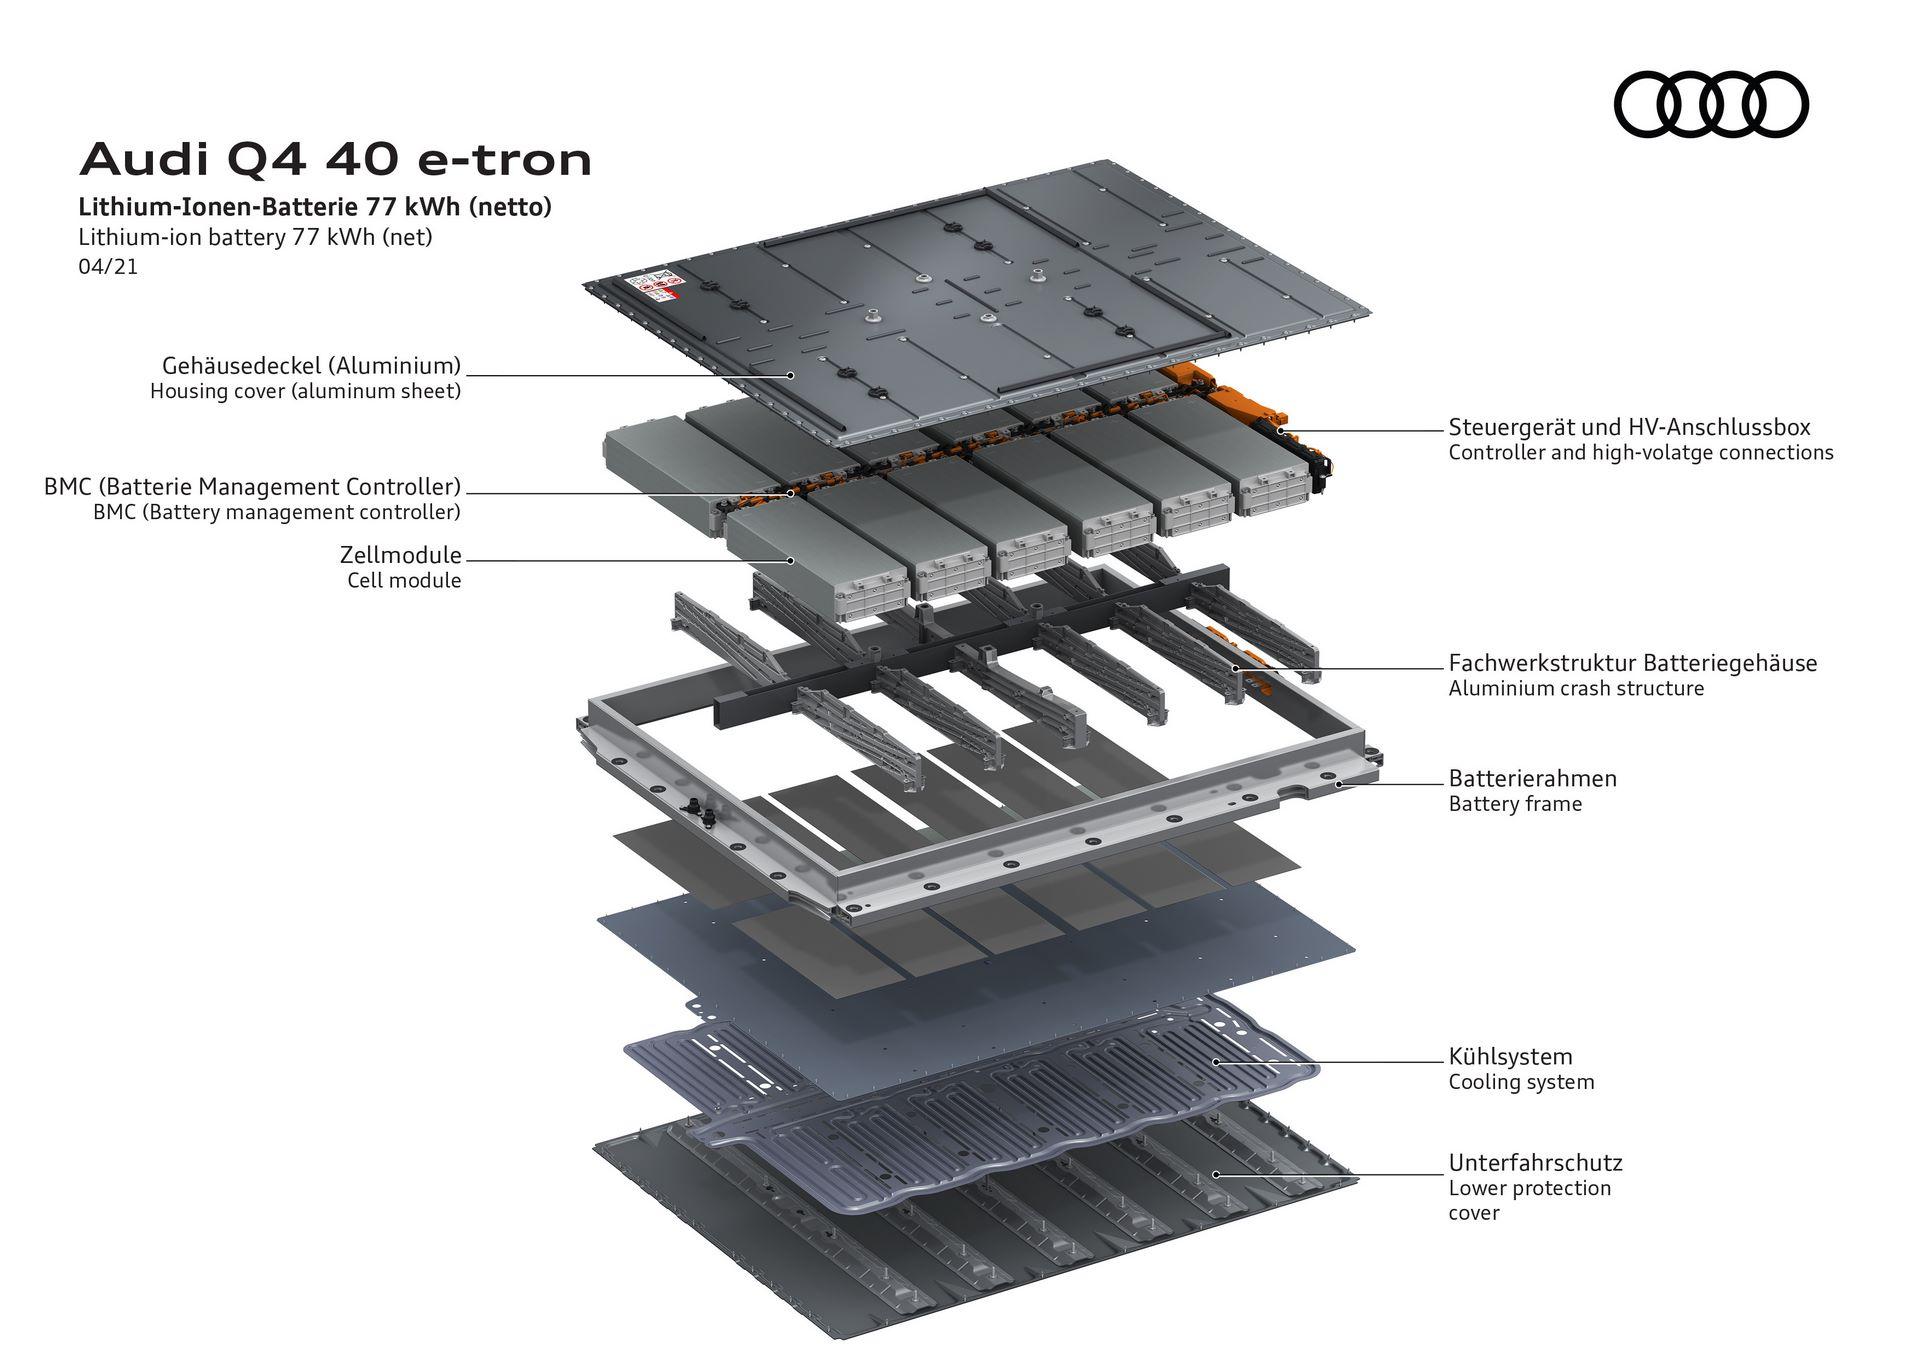 Audi-Q4-e-tron-and-Q4-e-tron-Sportback-118